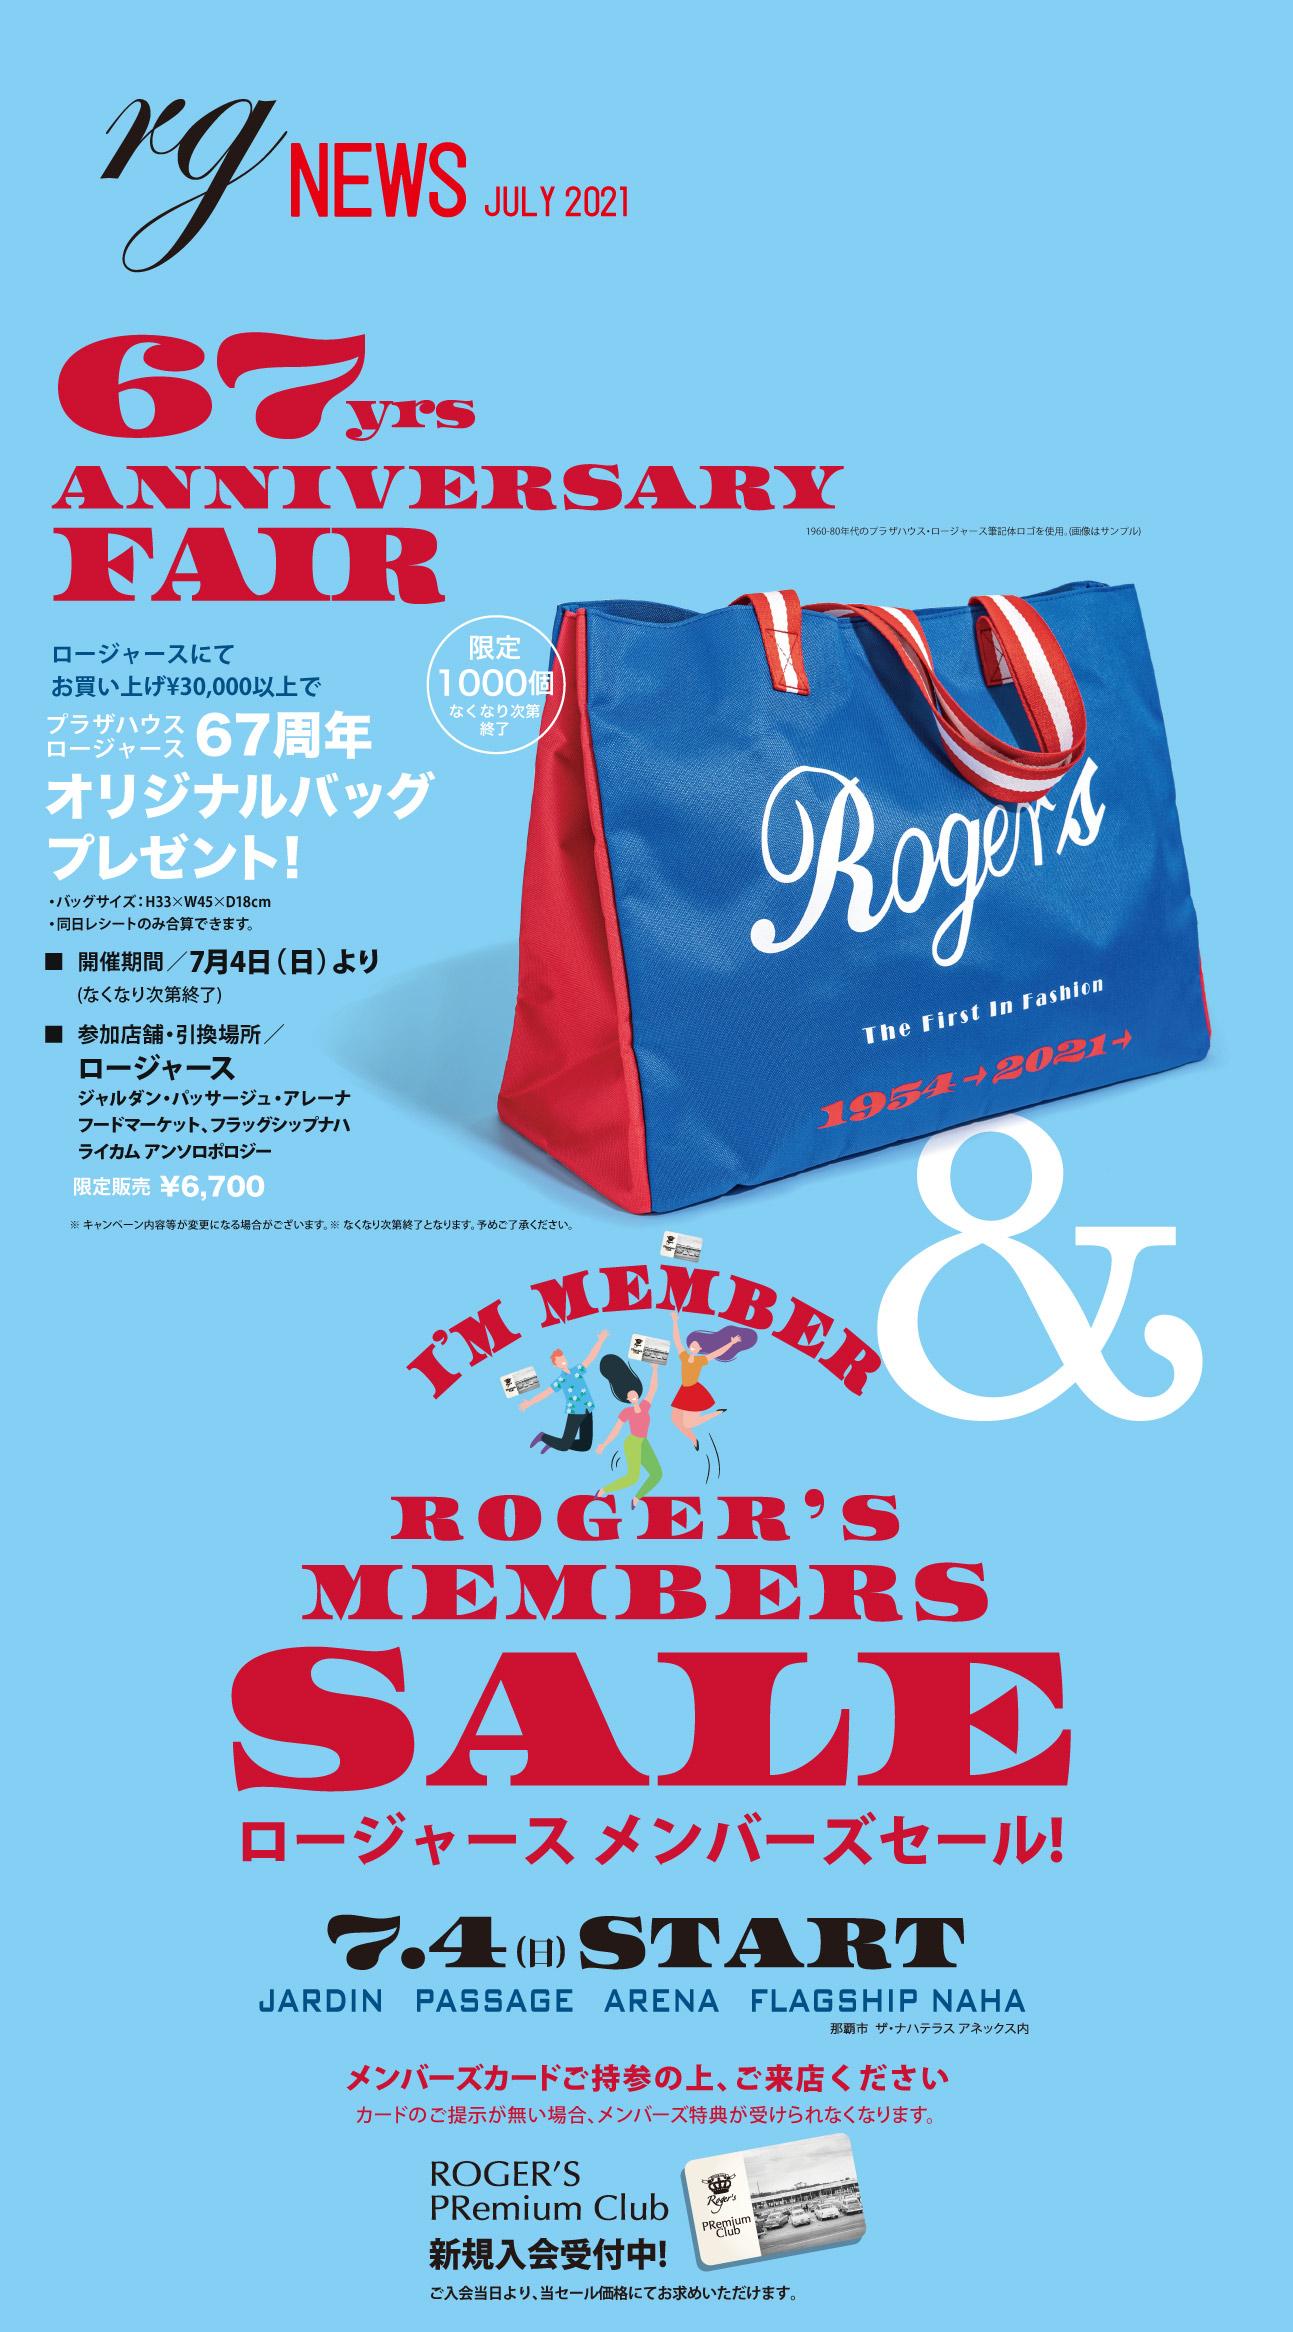 67th Anniversary Fair  & Roger's Members SALE